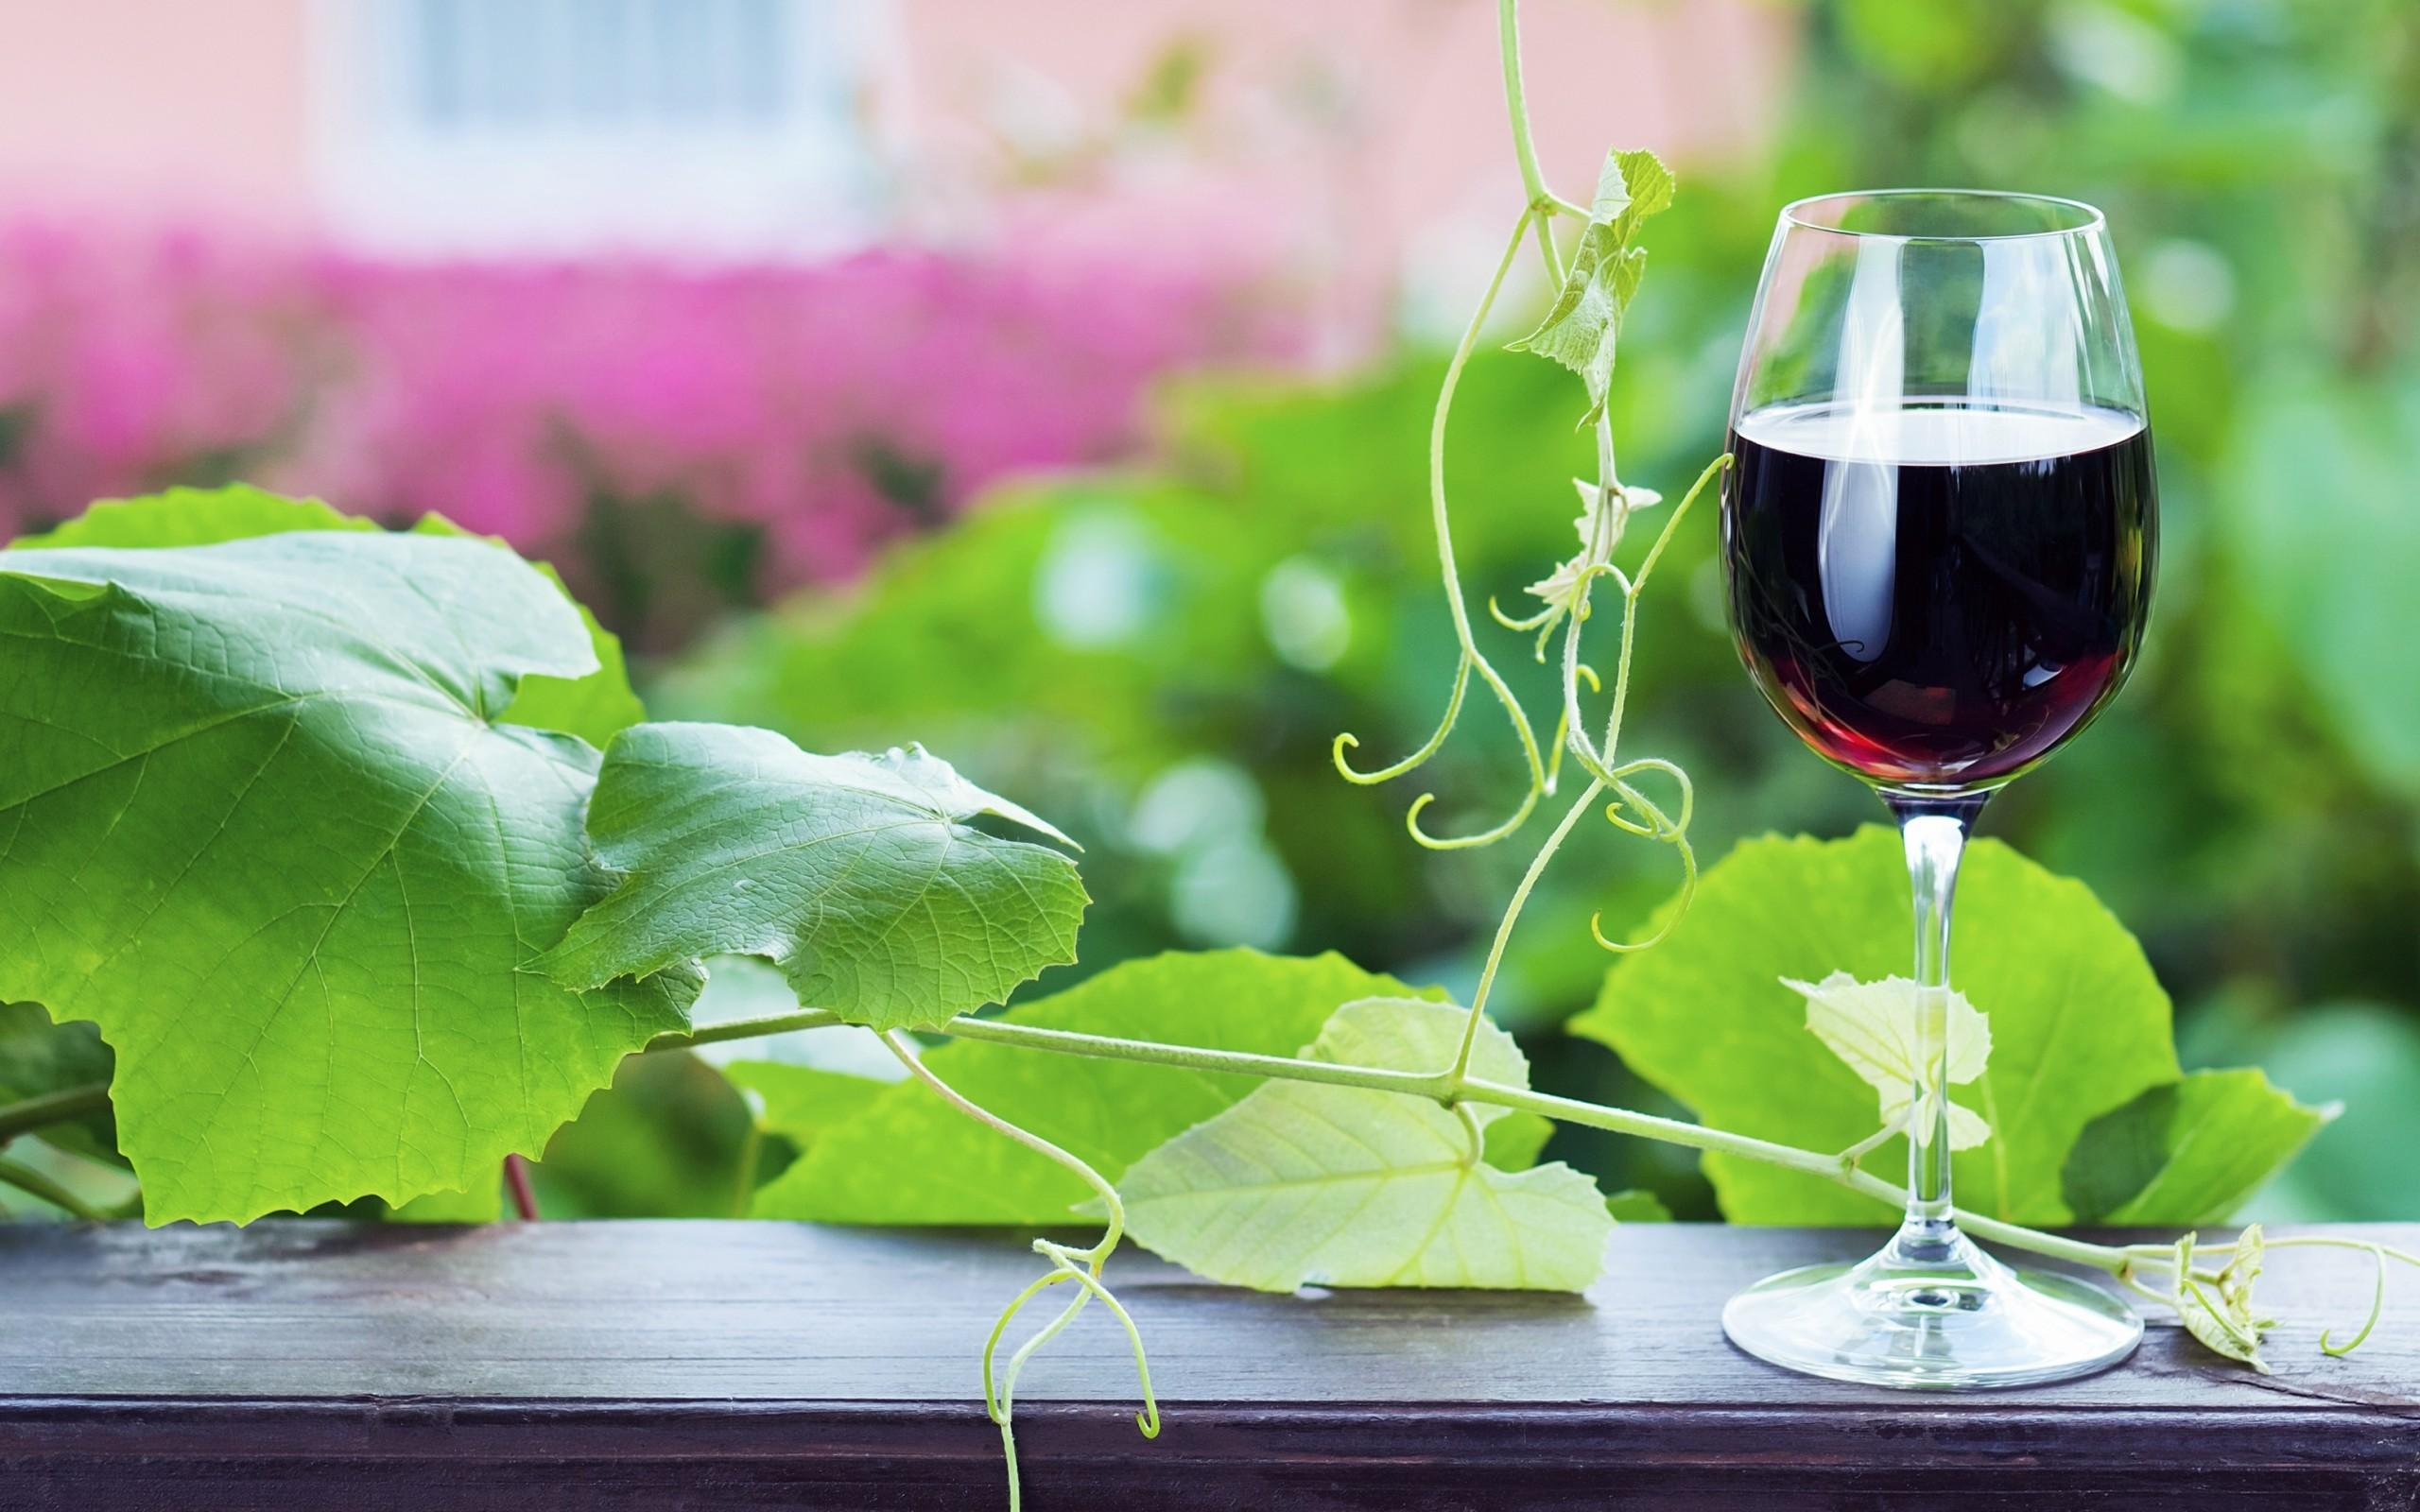 Вино - Wine 2 (65 обоев) » Смотри Красивые ...: lookw.ru/eda/169-vino-wine-2-65-oboev.html